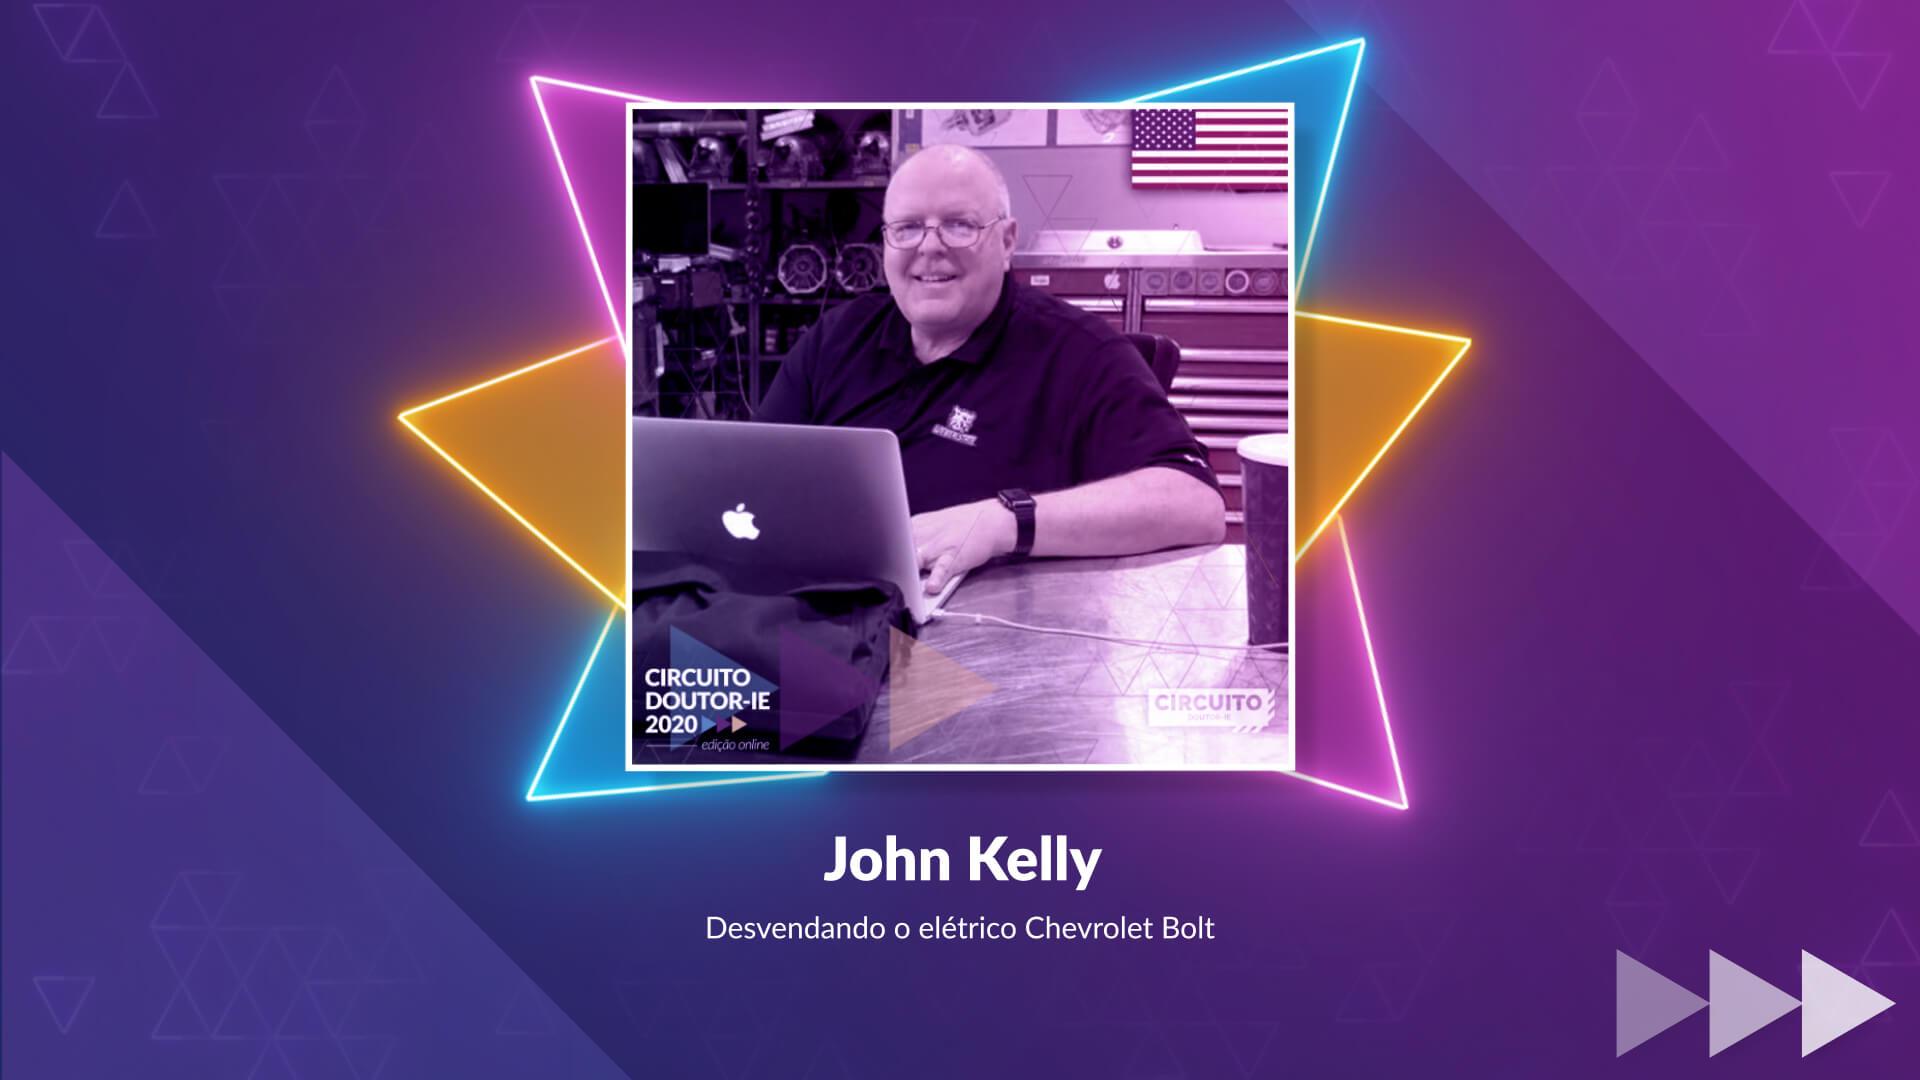 Circuito Doutor-IE 2020 edição online - palestrante John Kelly